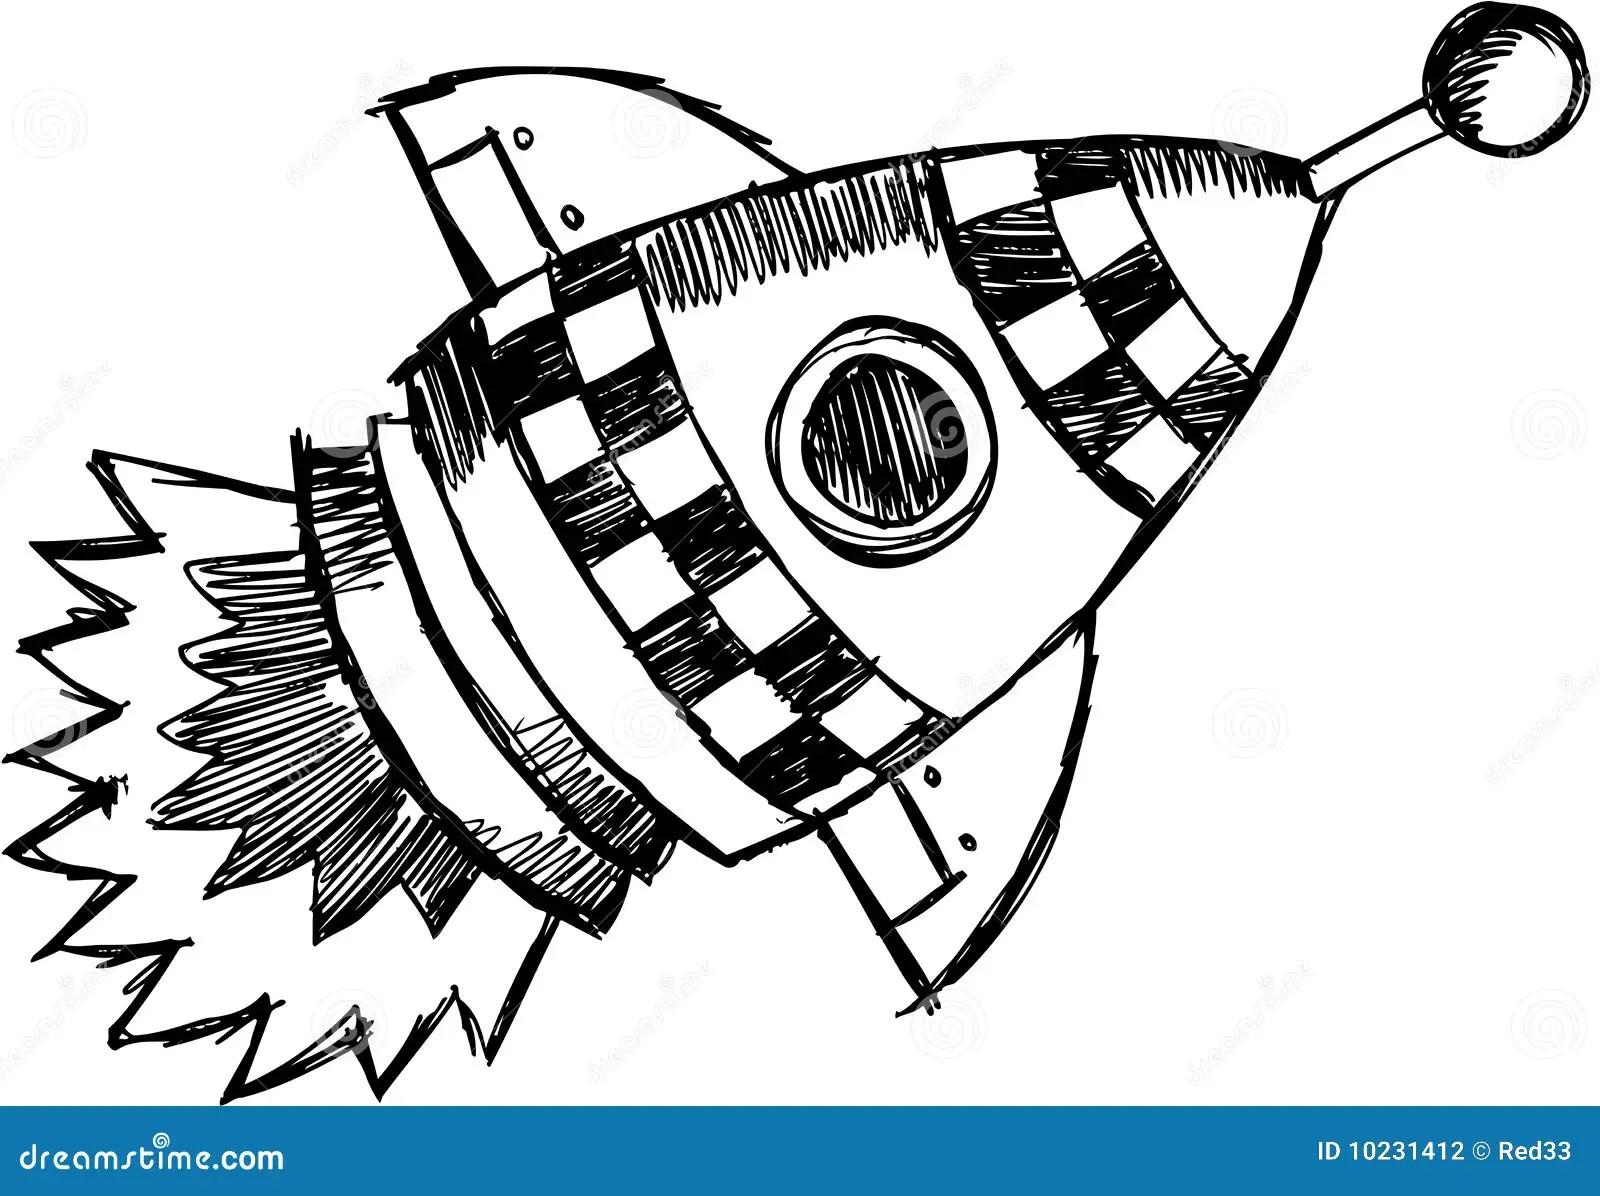 Sketchy Rocket Vector Illustration Stock Vector